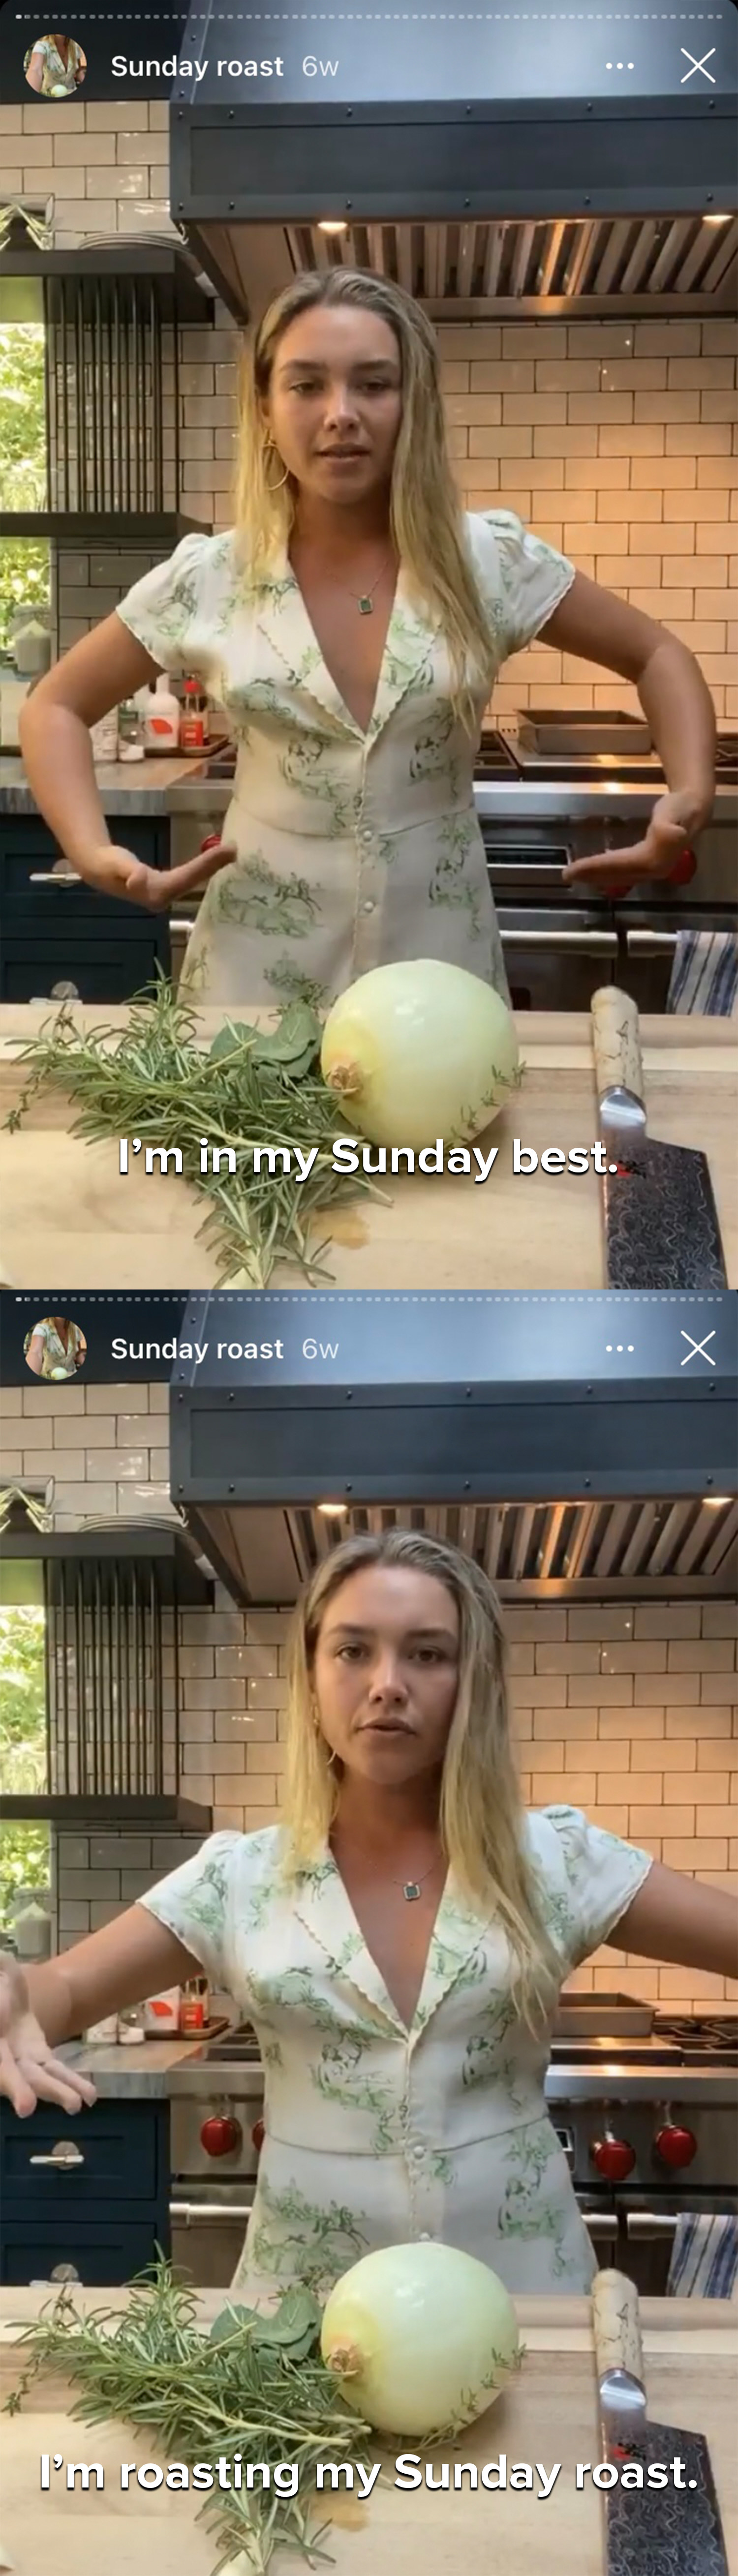 Flo says she's in her Sunday best roasting her Sunday roast